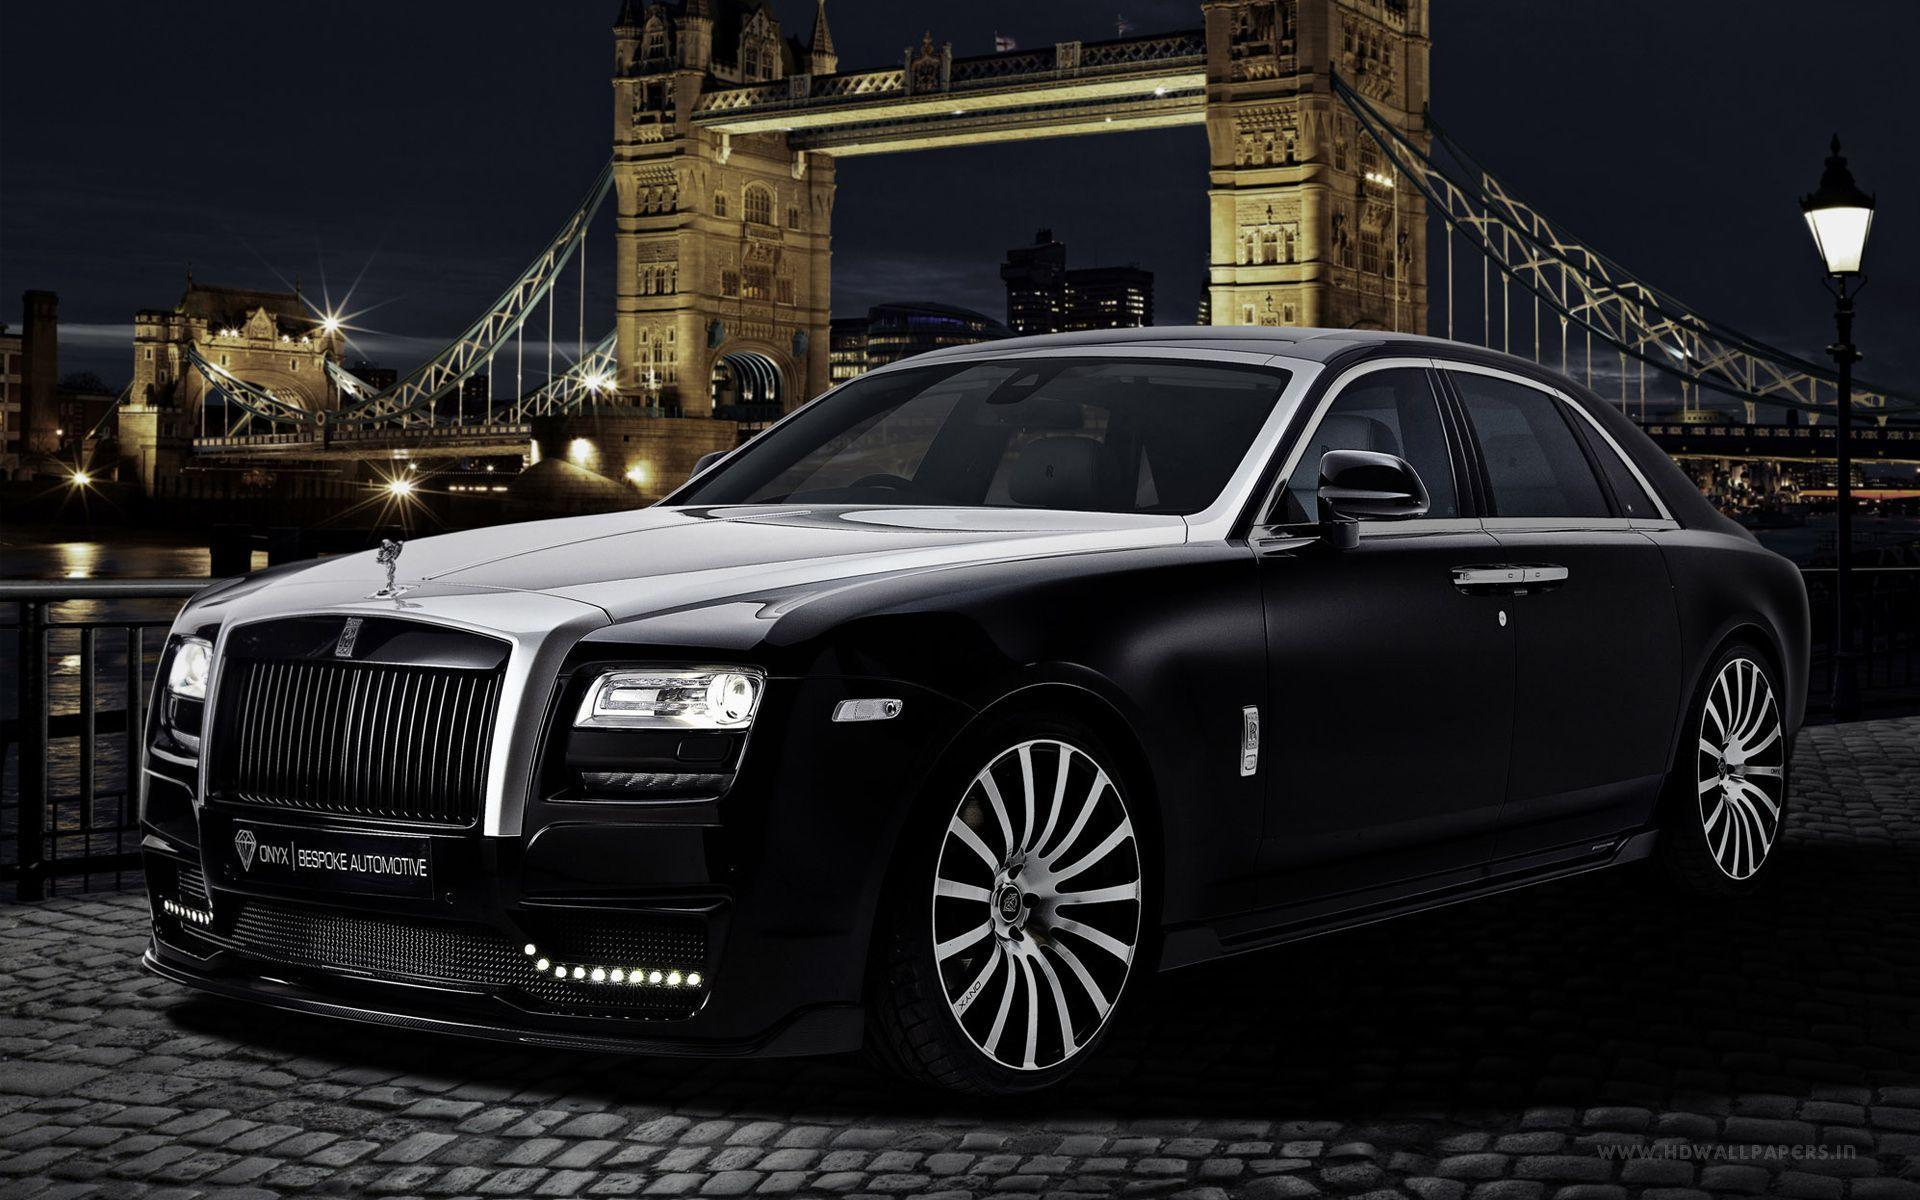 Rolls Royce Ghost Wallpapers Top Free Rolls Royce Ghost Backgrounds Wallpaperaccess